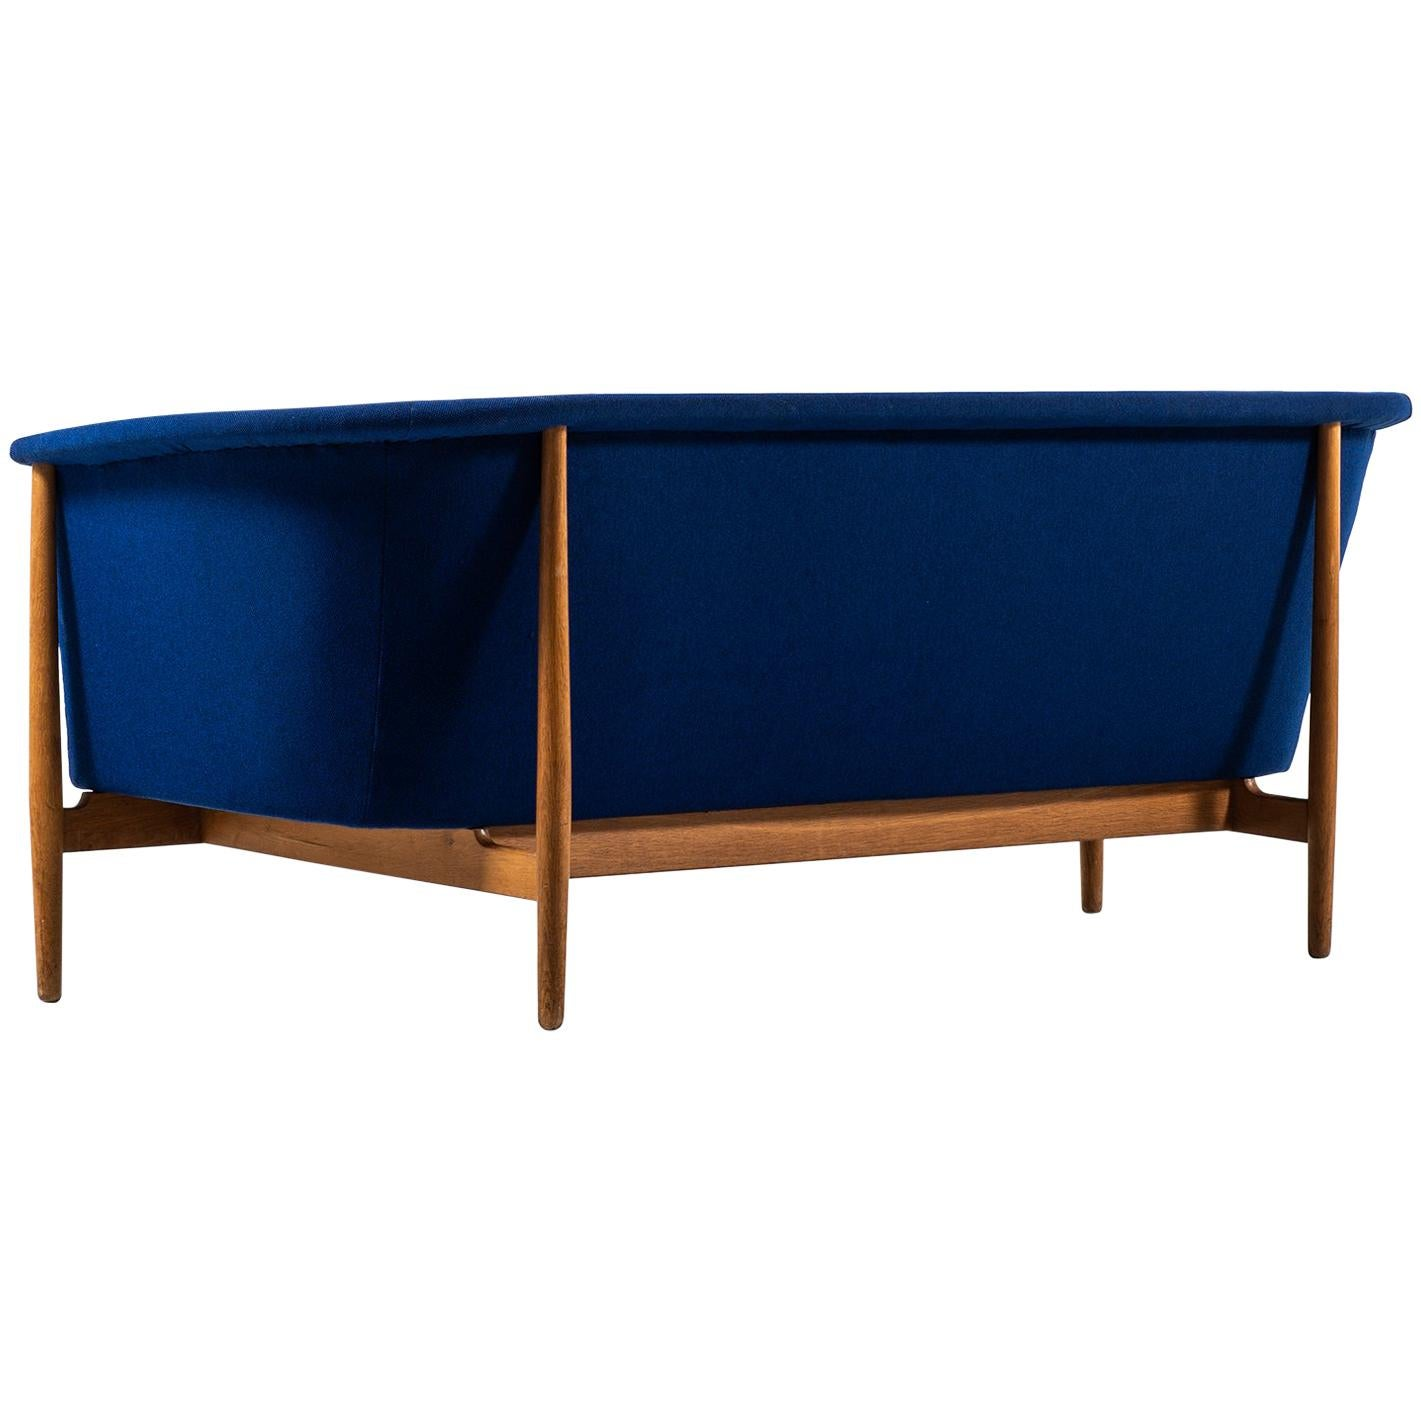 Nanna Ditzel Freestanding Sofa by Knud Willadsen in Denmark